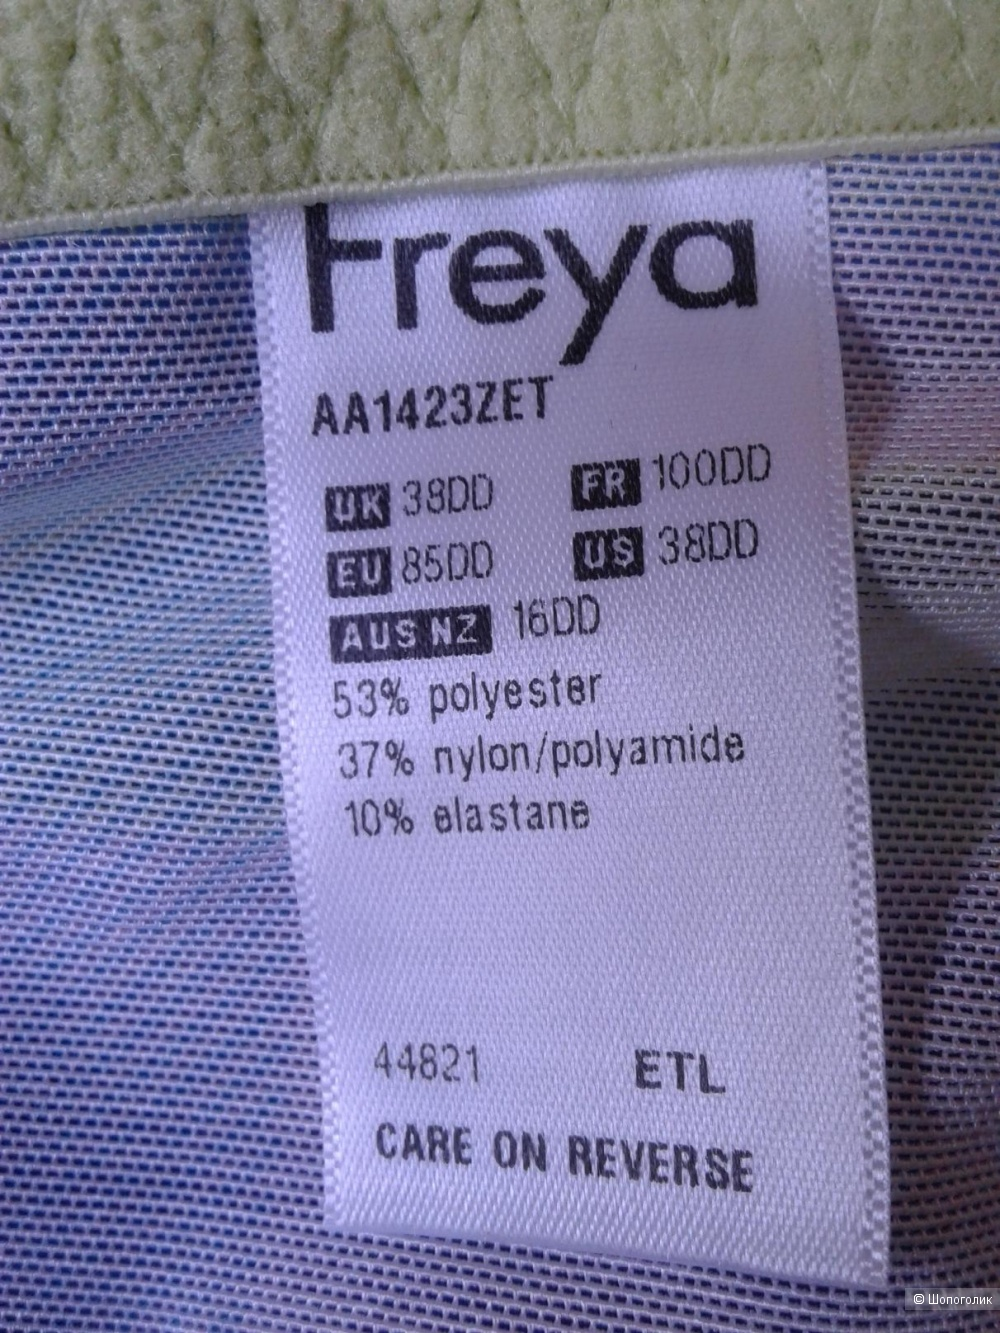 Комплект лифчик + шорты Freya англ 38DD + XL